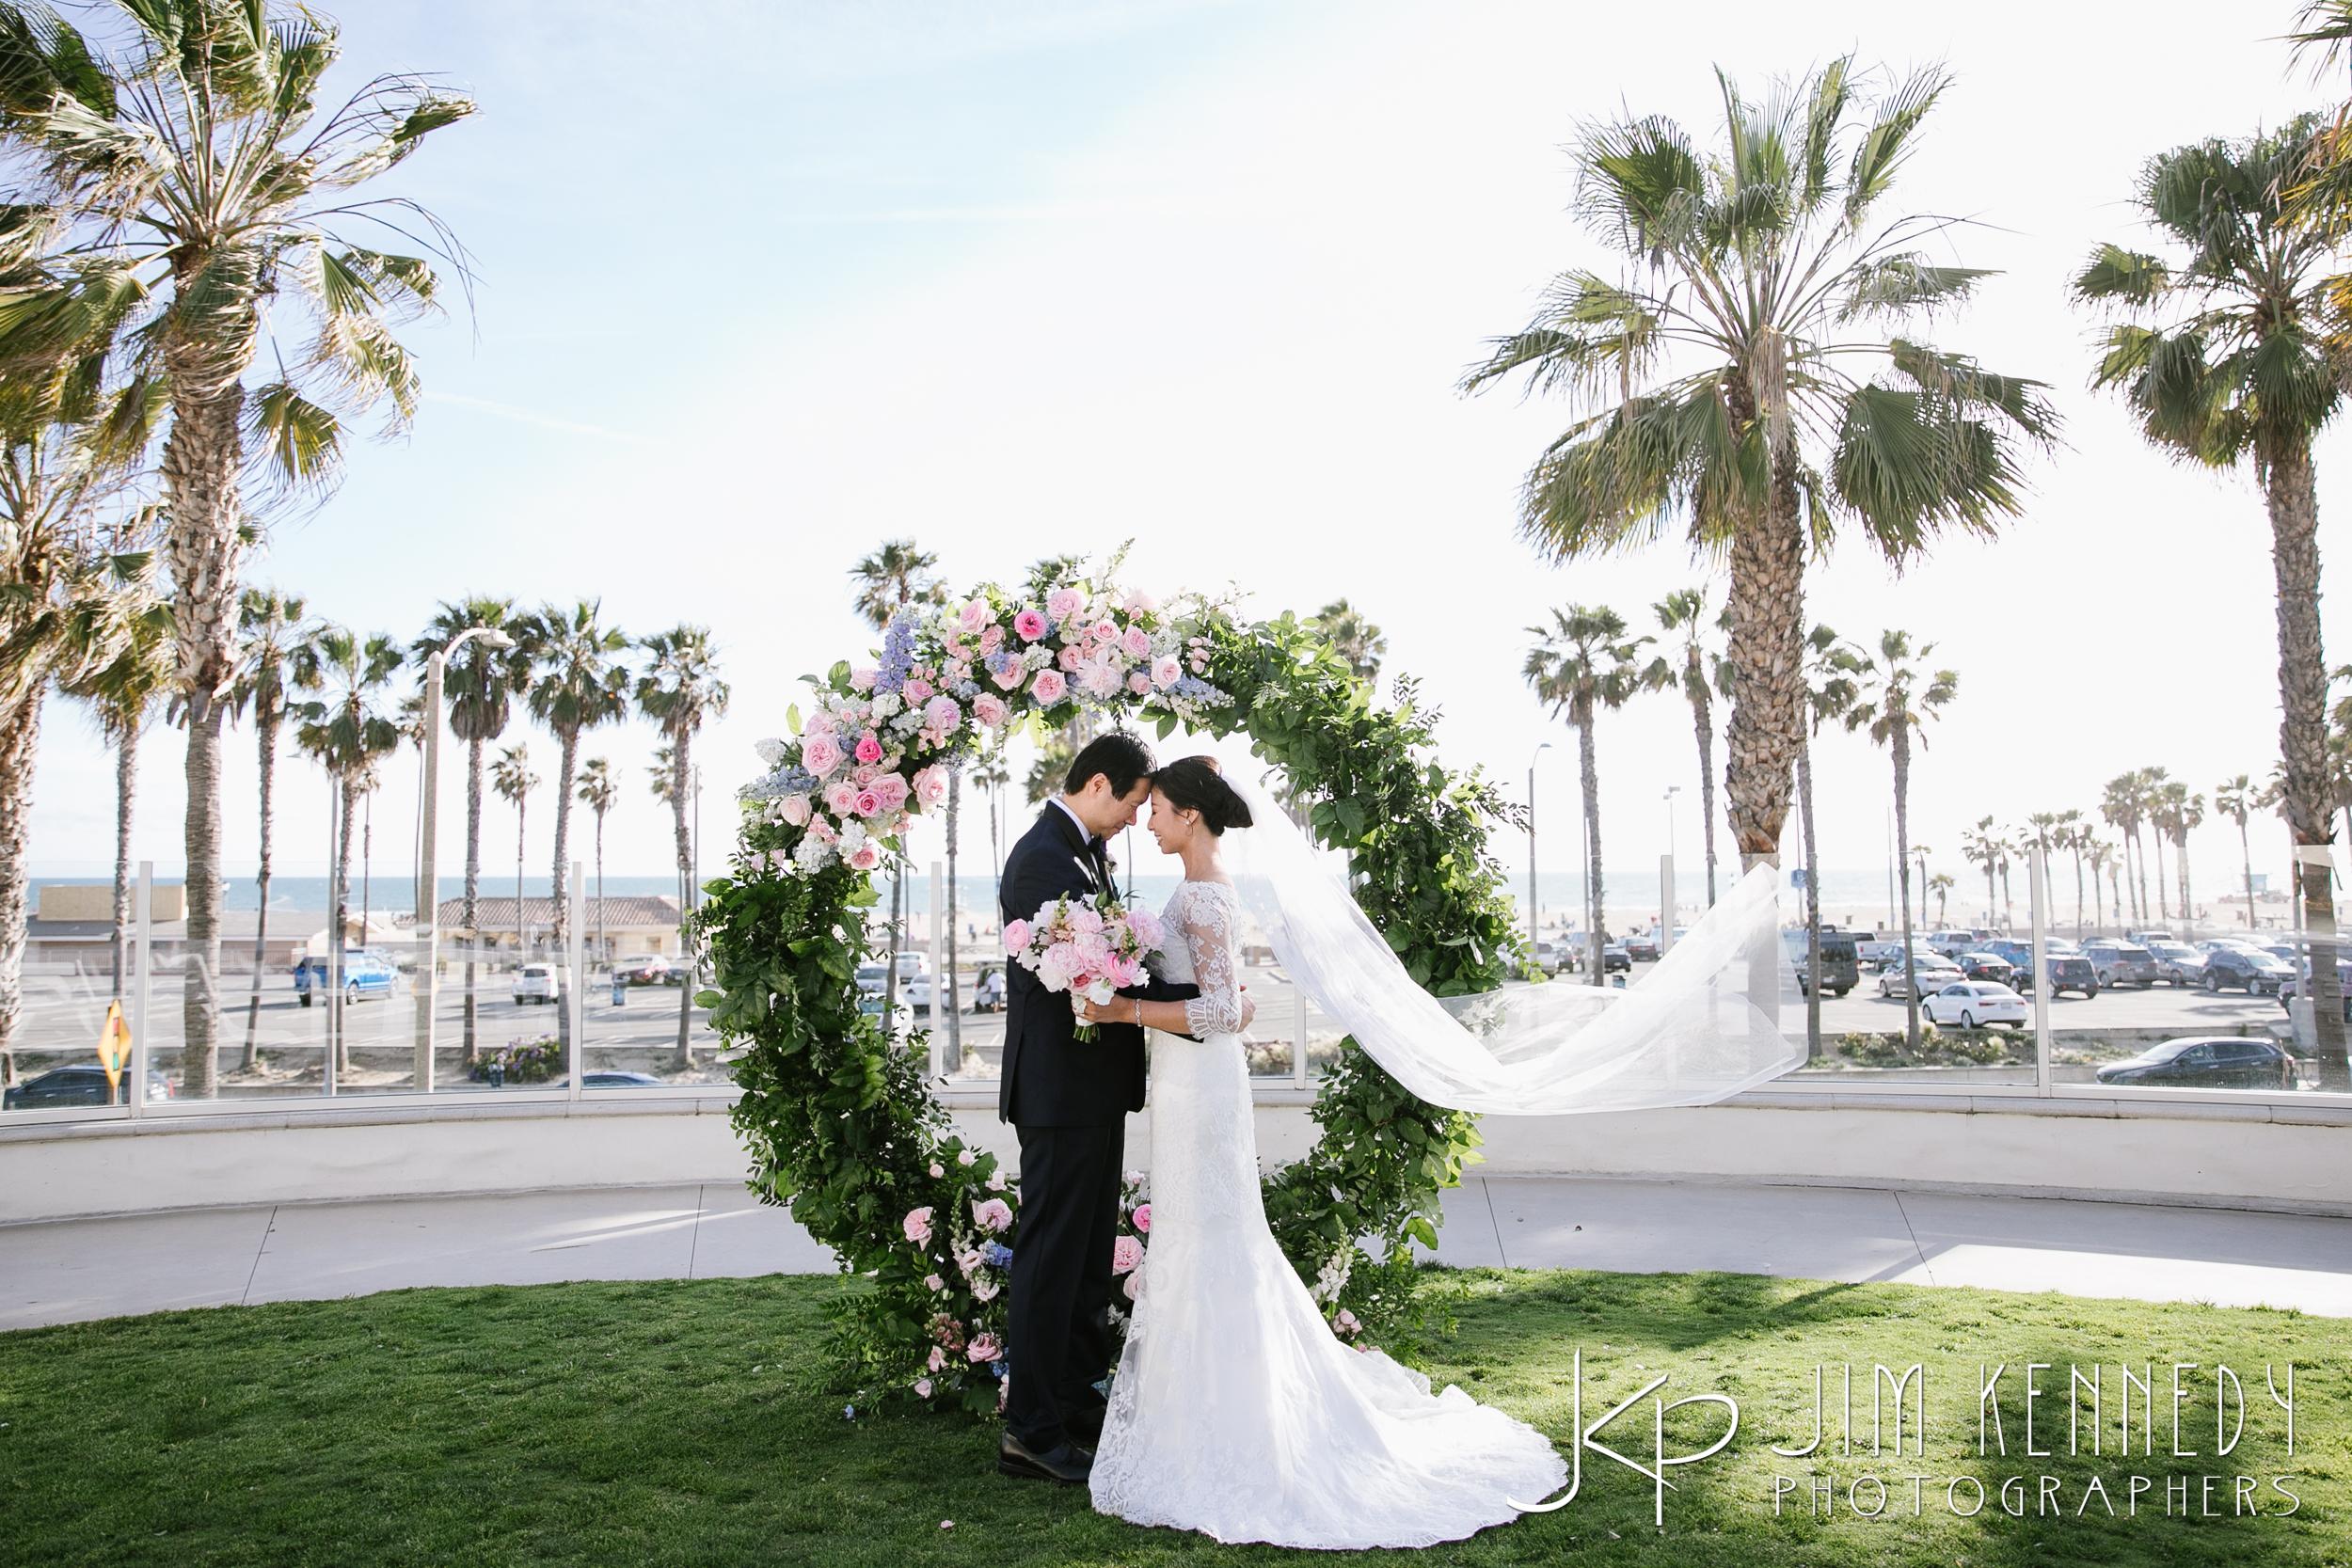 hyatt_huntington_beach_wedding-4955.jpg